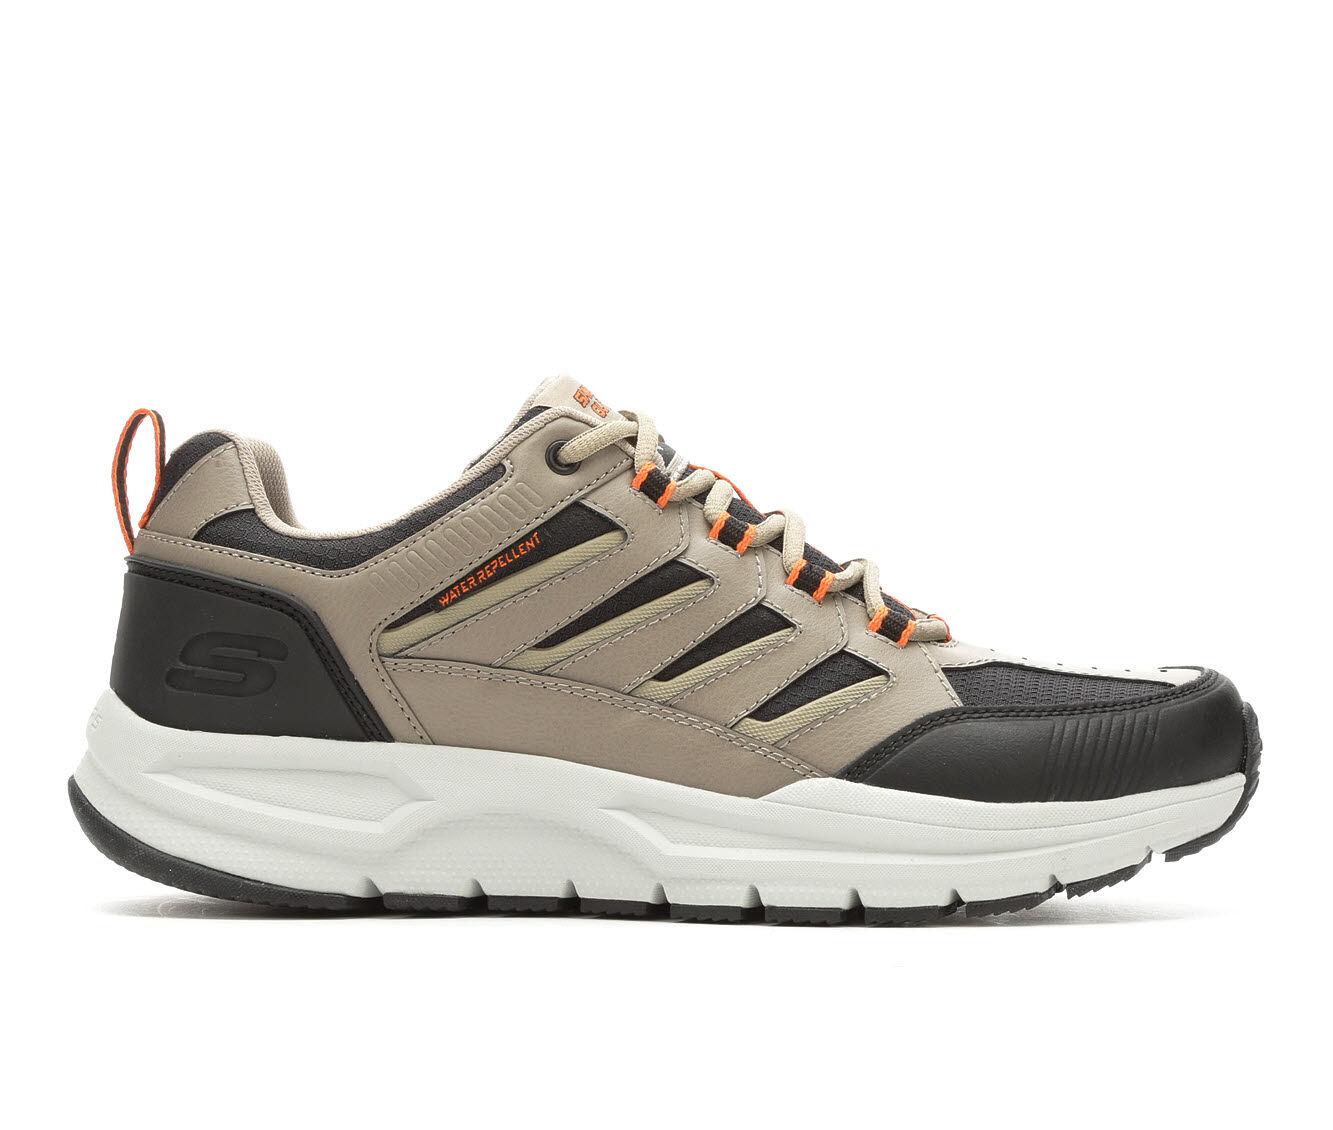 shop cheap new series Men's Skechers Escape Plan 2.0 Running Shoes Tan/Blk/Wht/Org